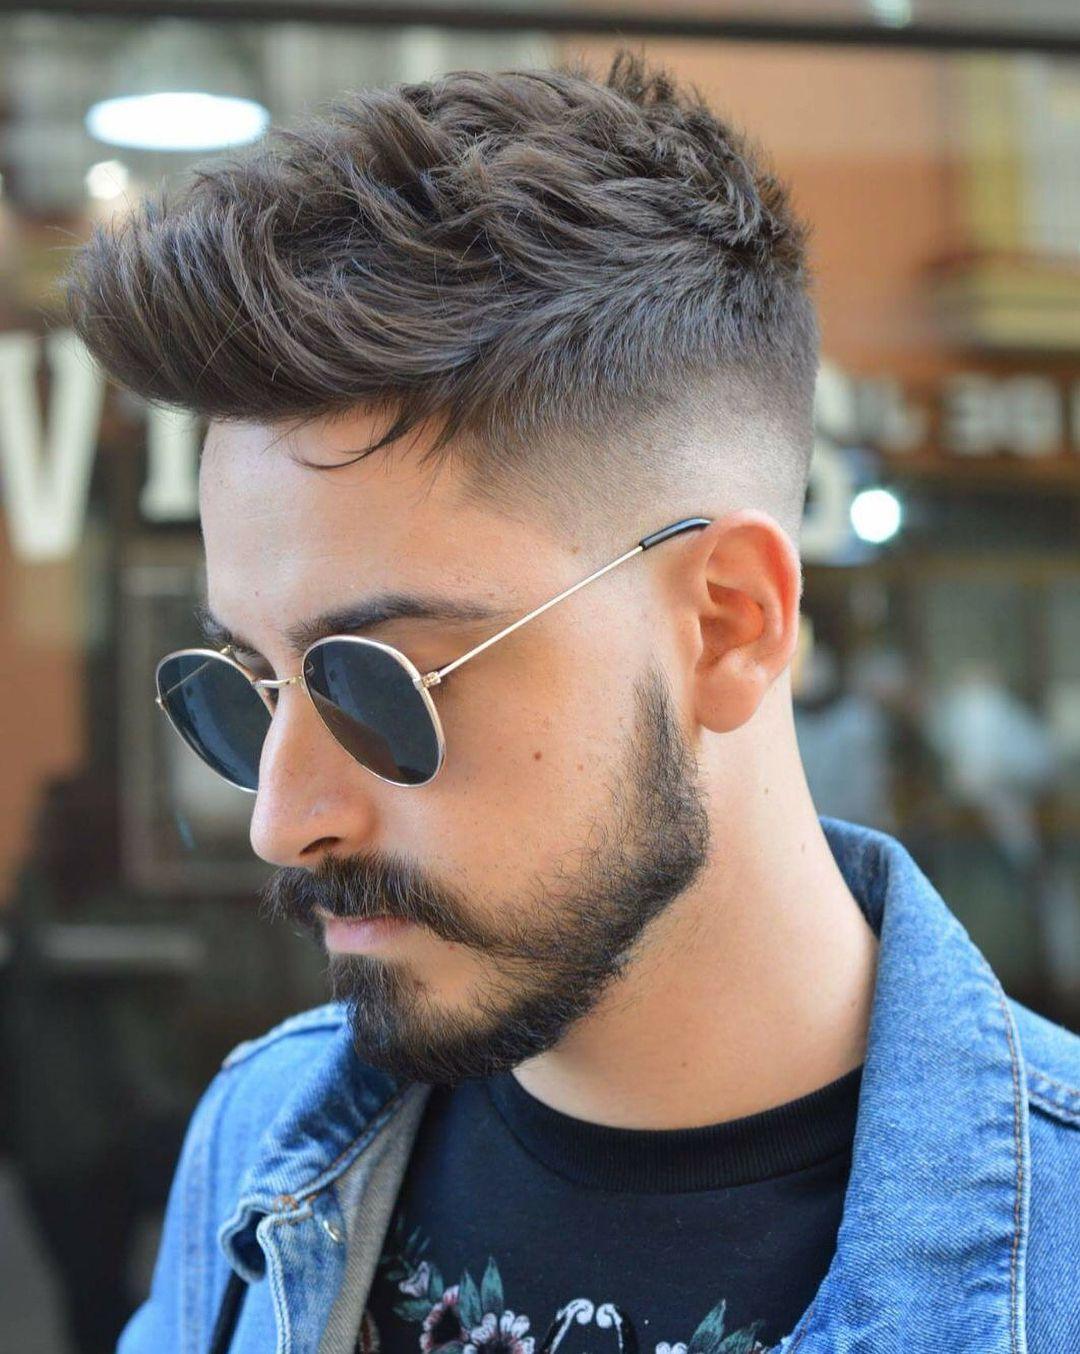 top 100 coiffures en d grad top 100 coiffures en d grad pinterest haircut styles fade. Black Bedroom Furniture Sets. Home Design Ideas